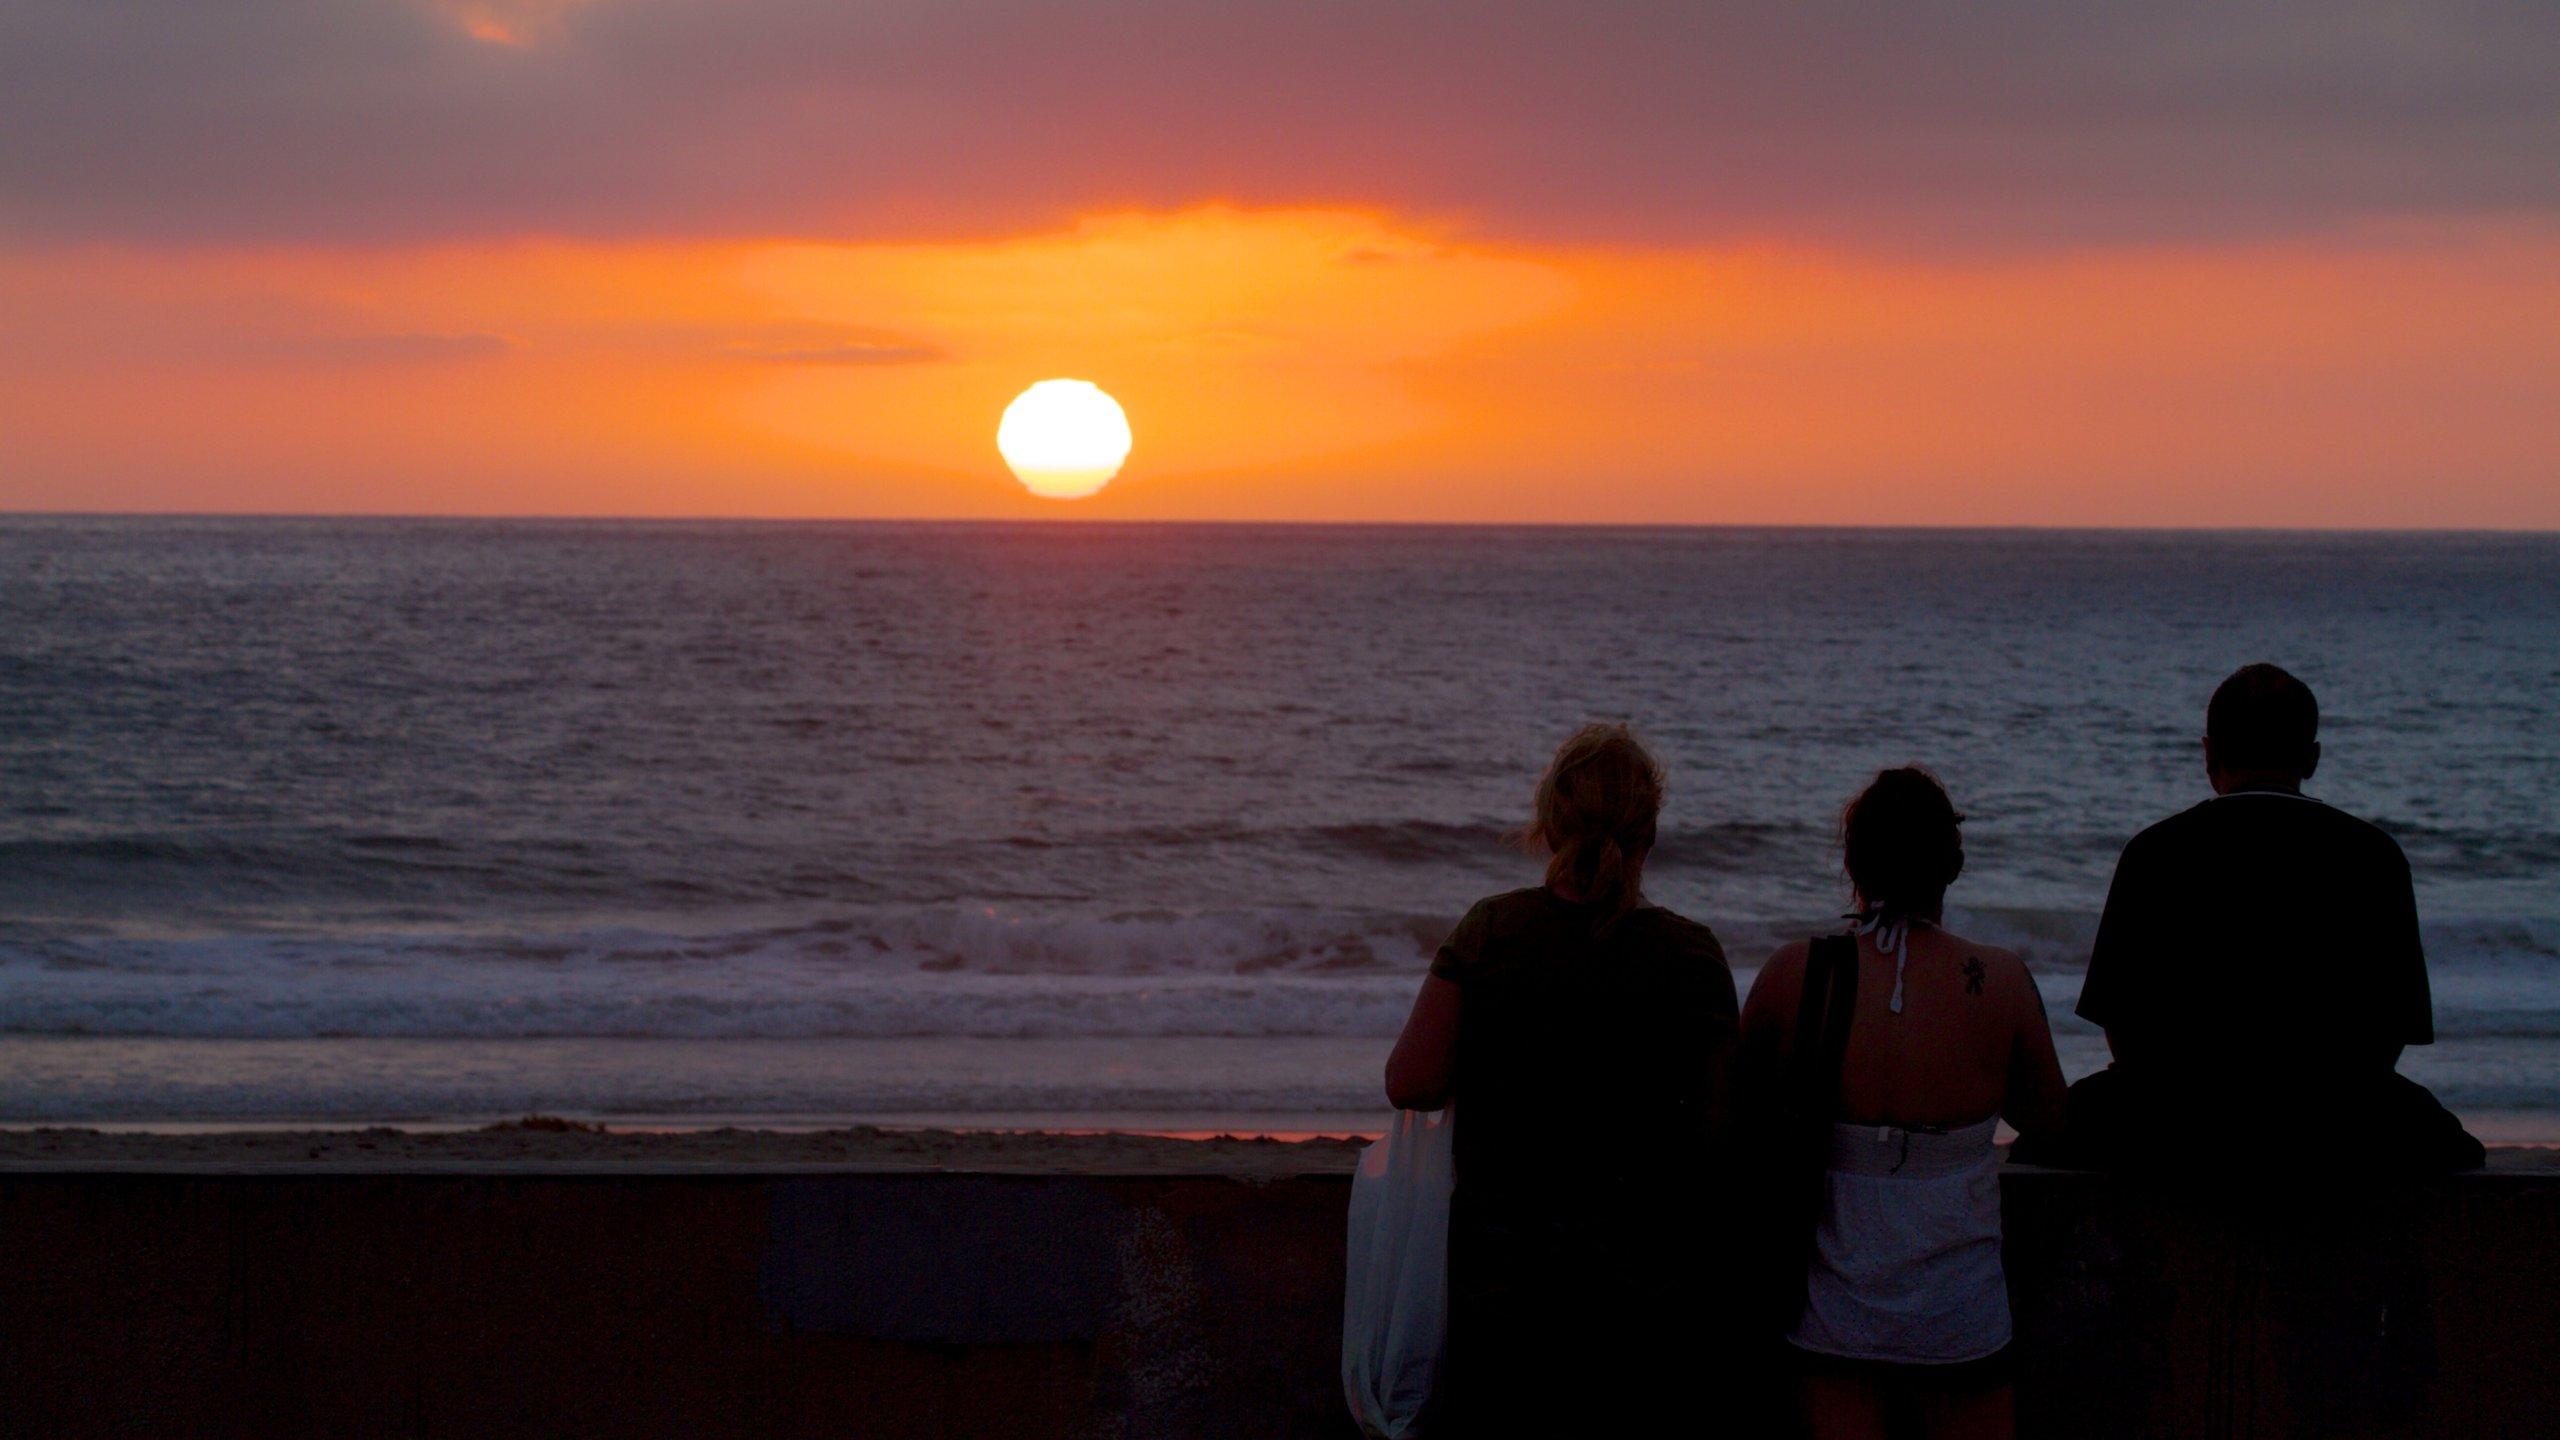 North Pacific Beach, San Diego, California, United States of America